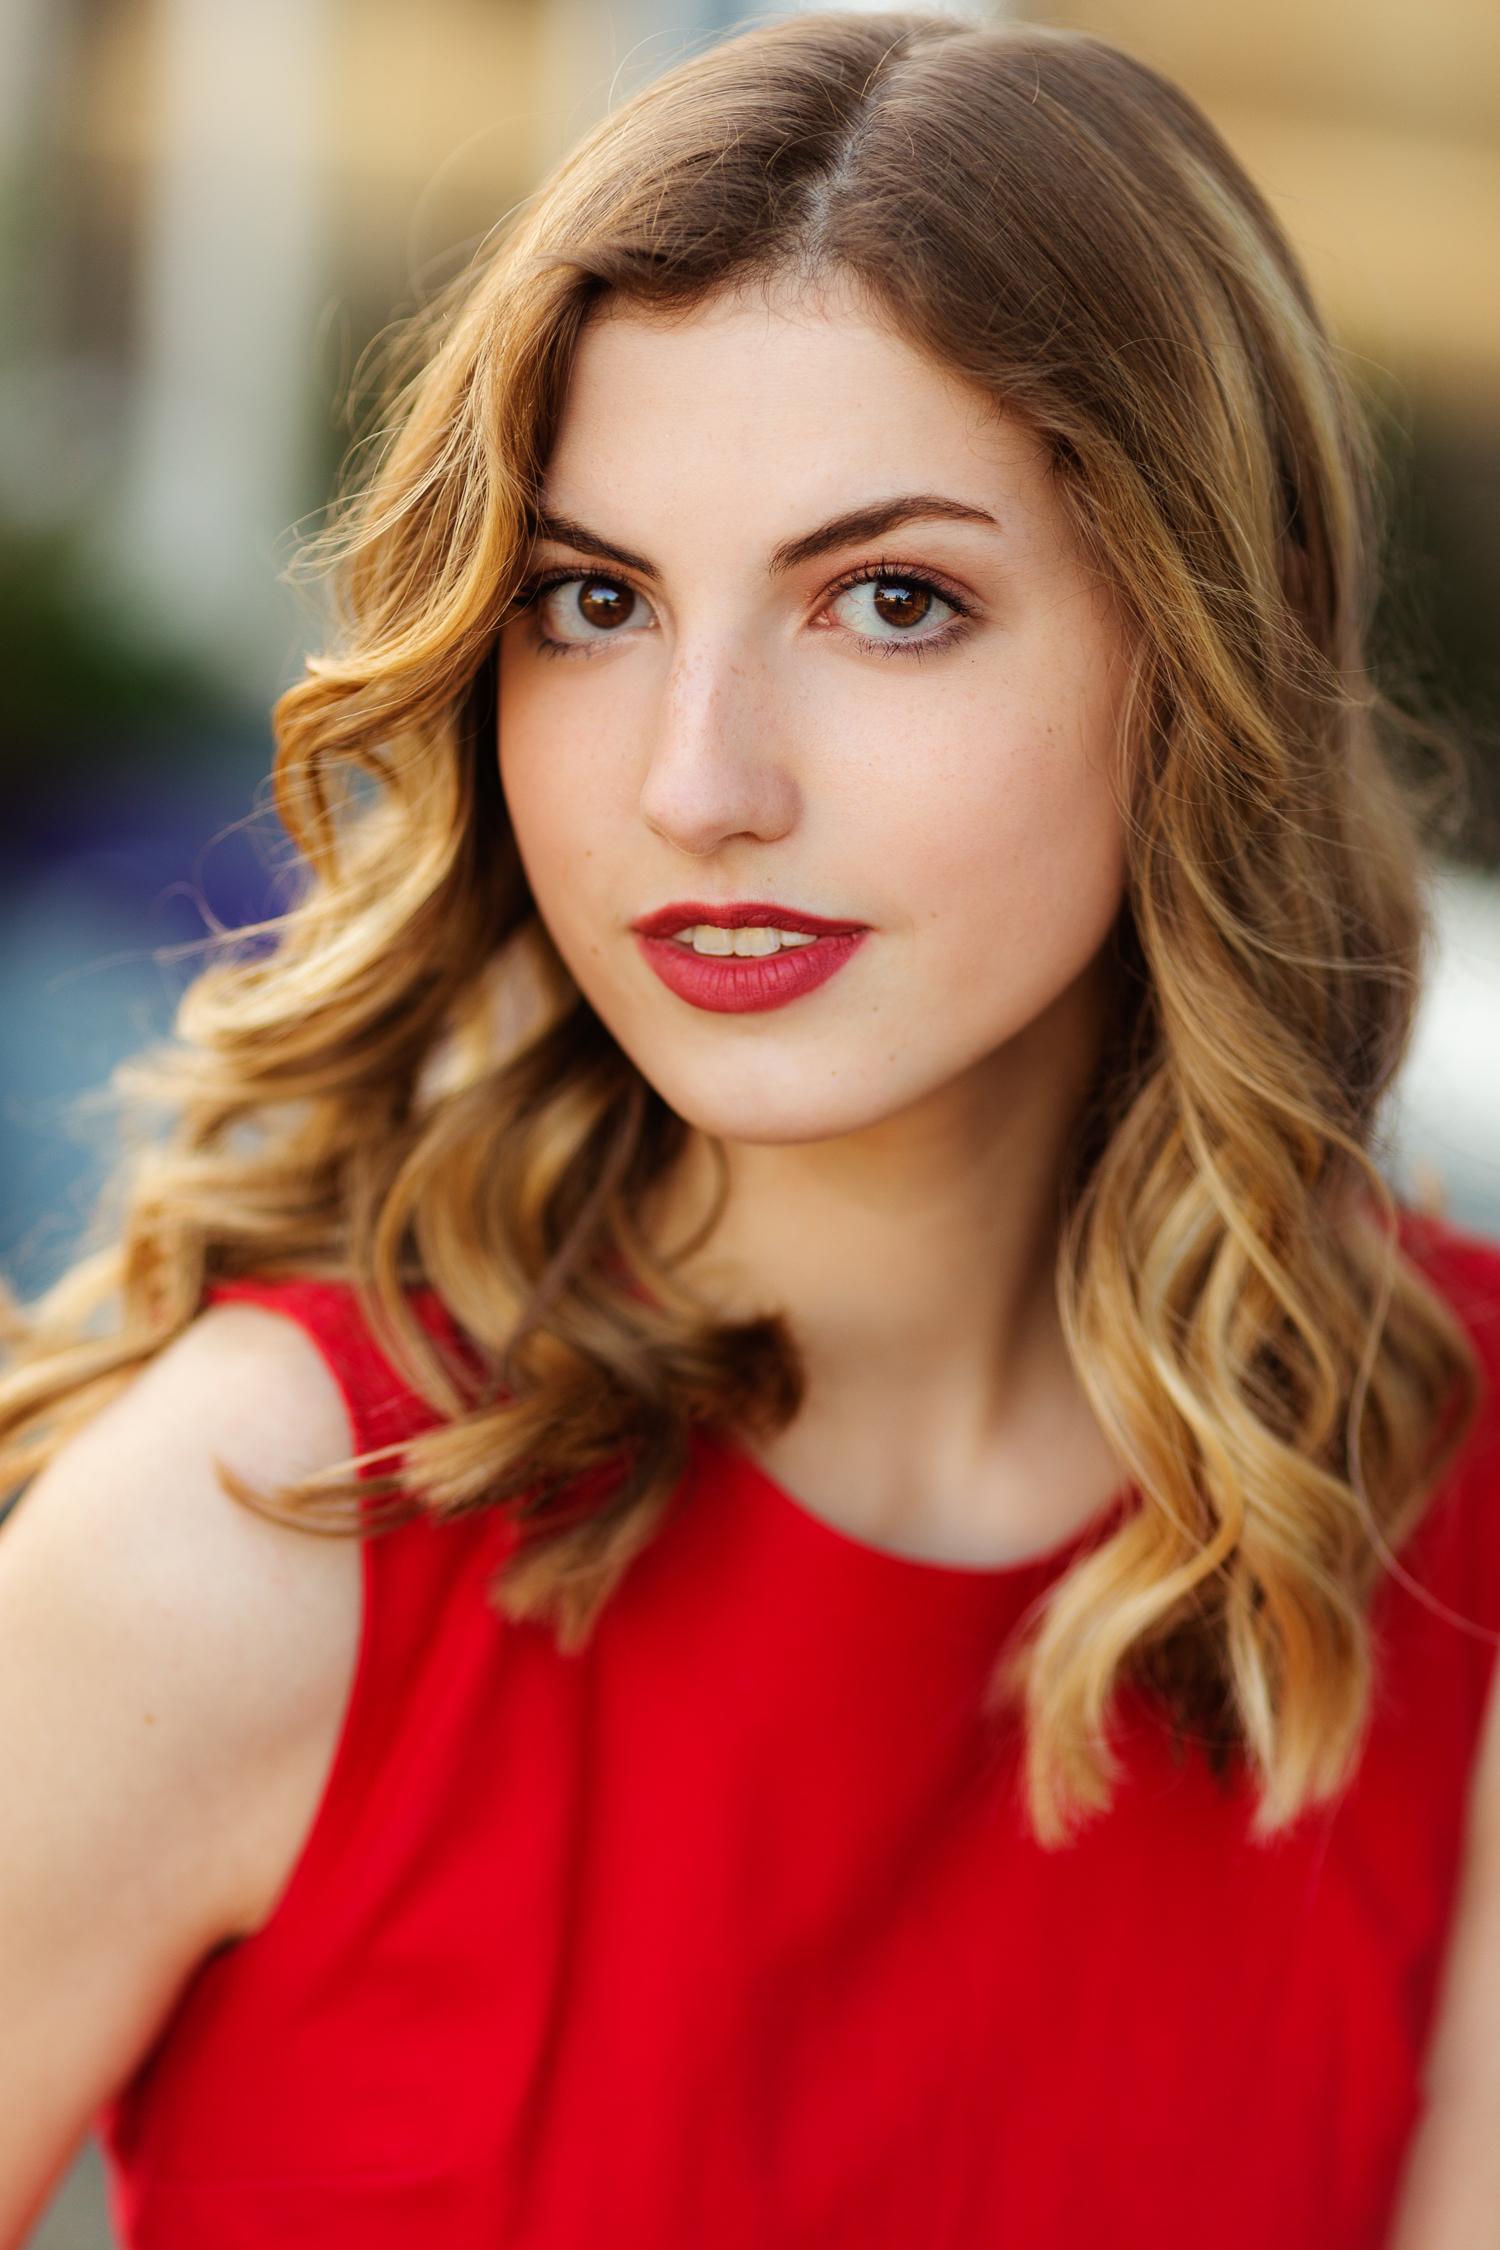 ariellanoellephotography-actor-headshot-modeling-portfolio-actress-seattle-area-washington-photographer-portraits-1-6.jpg